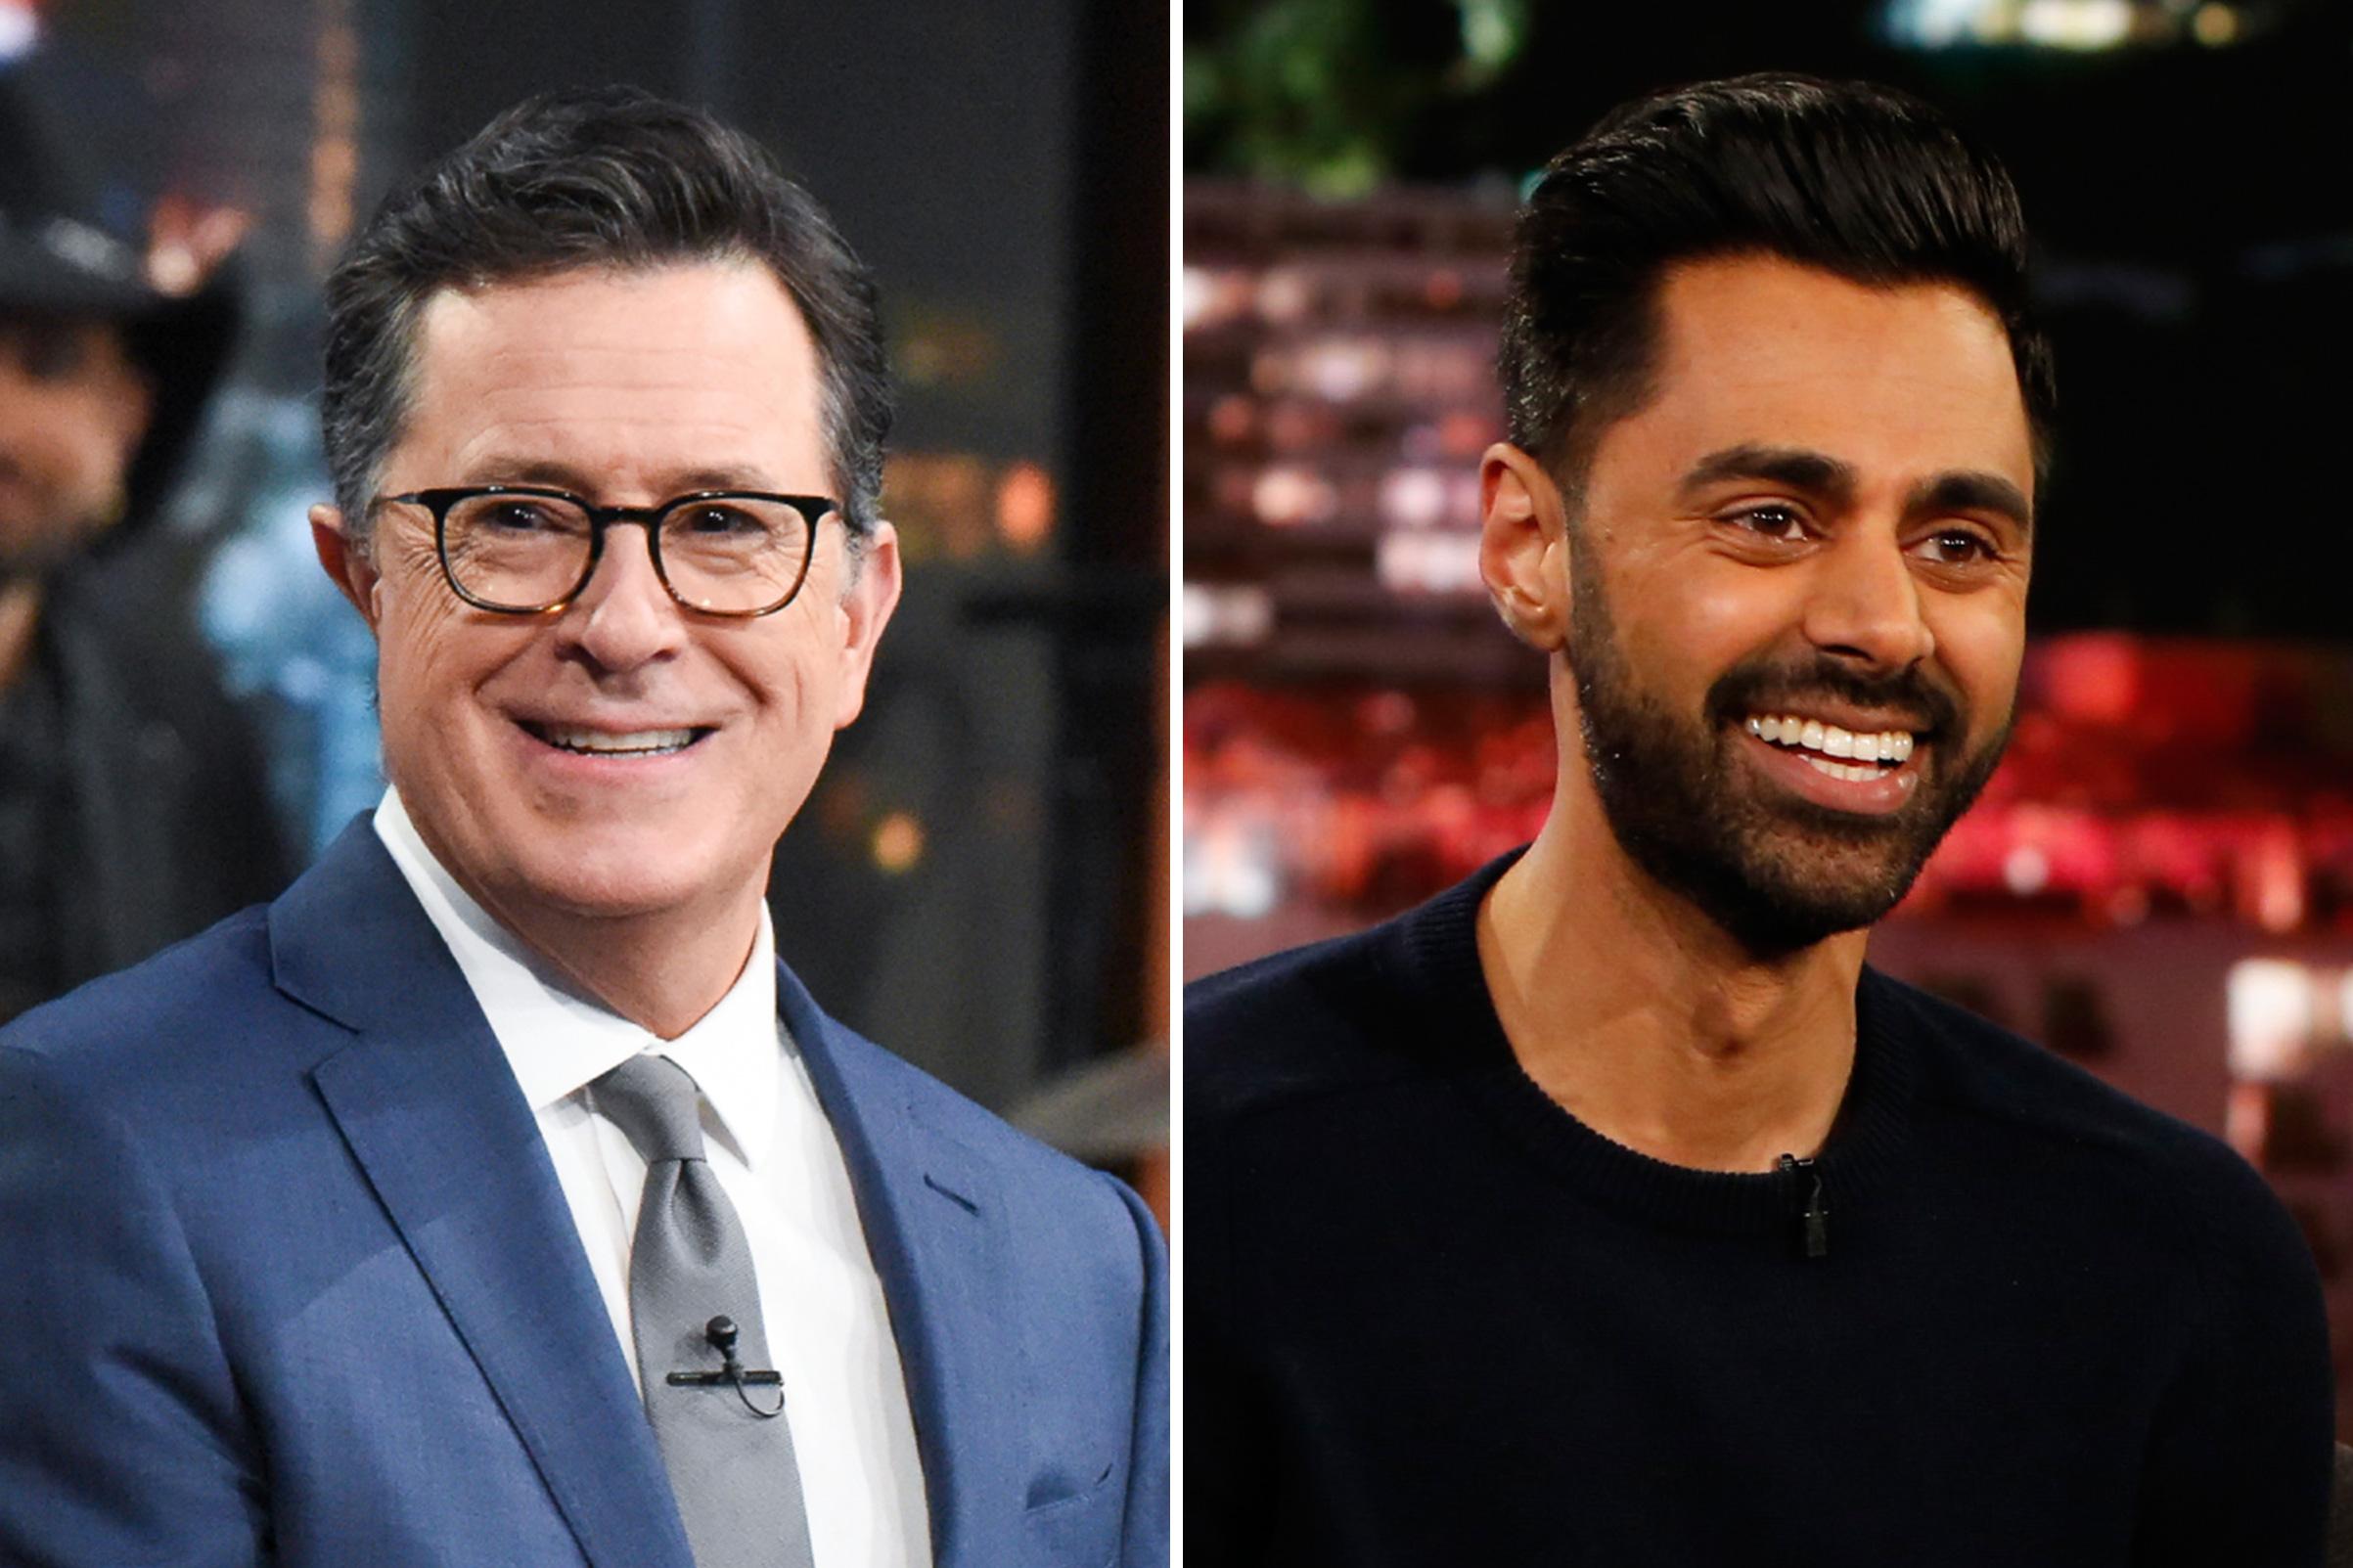 Stephen Colbert and Hasan Minhaj